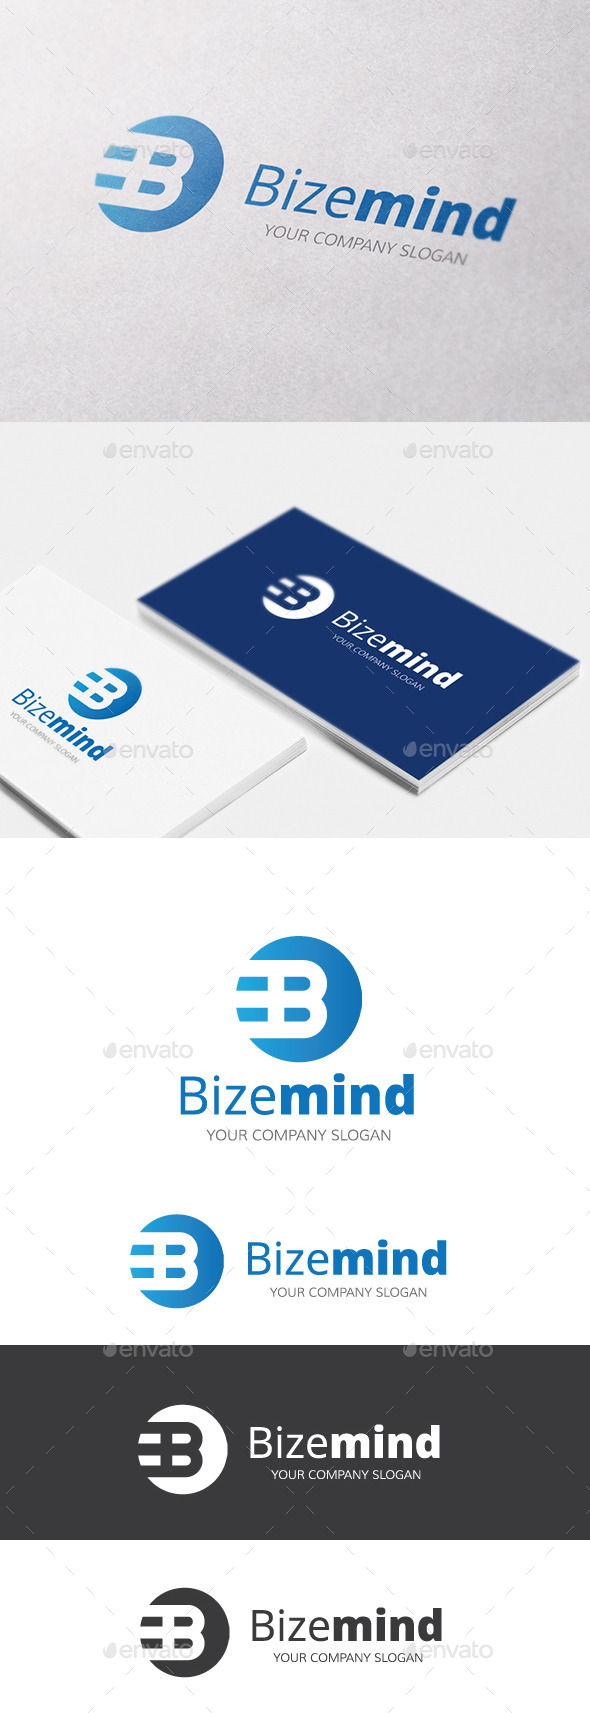 GraphicRiver Bizemind B Letter Logo 10611091